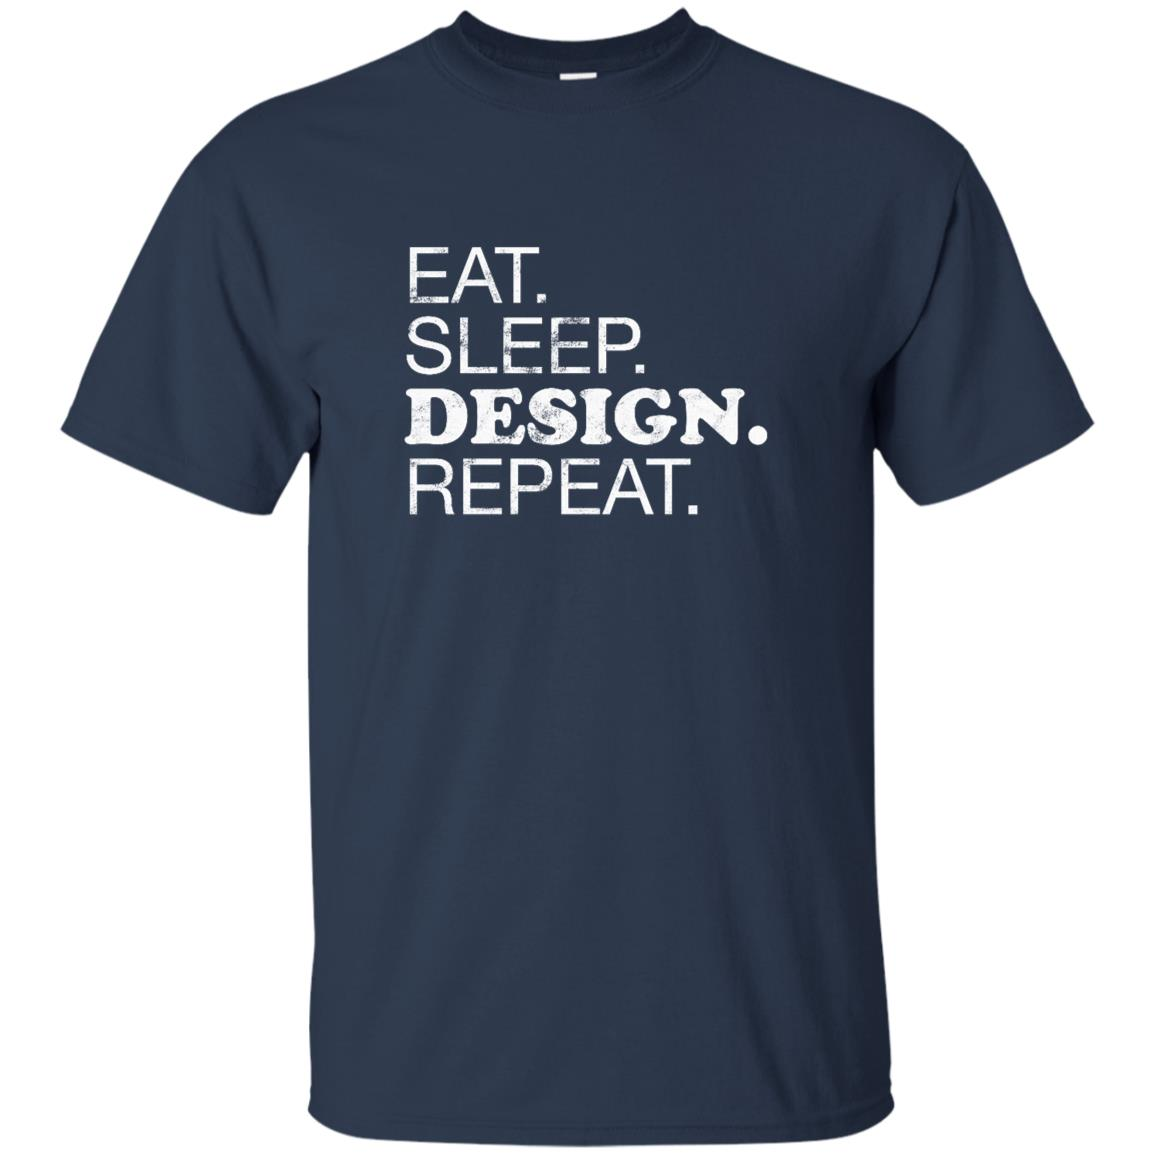 Eat sleep design repeat funny graphic designer Unisex Short Sleeve